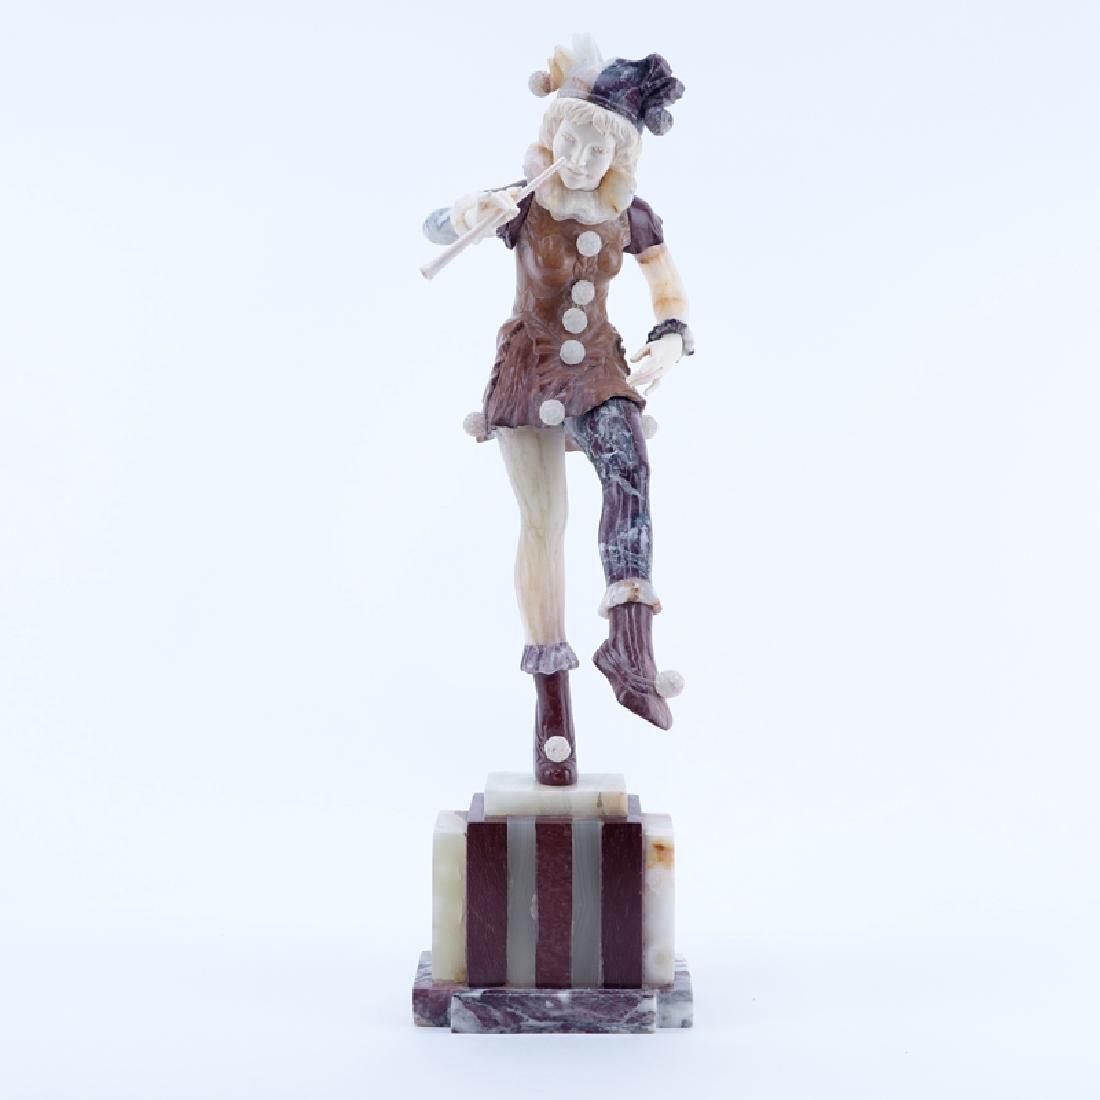 Antique Art Deco Marble, Onyx Harlequin Sculpture.